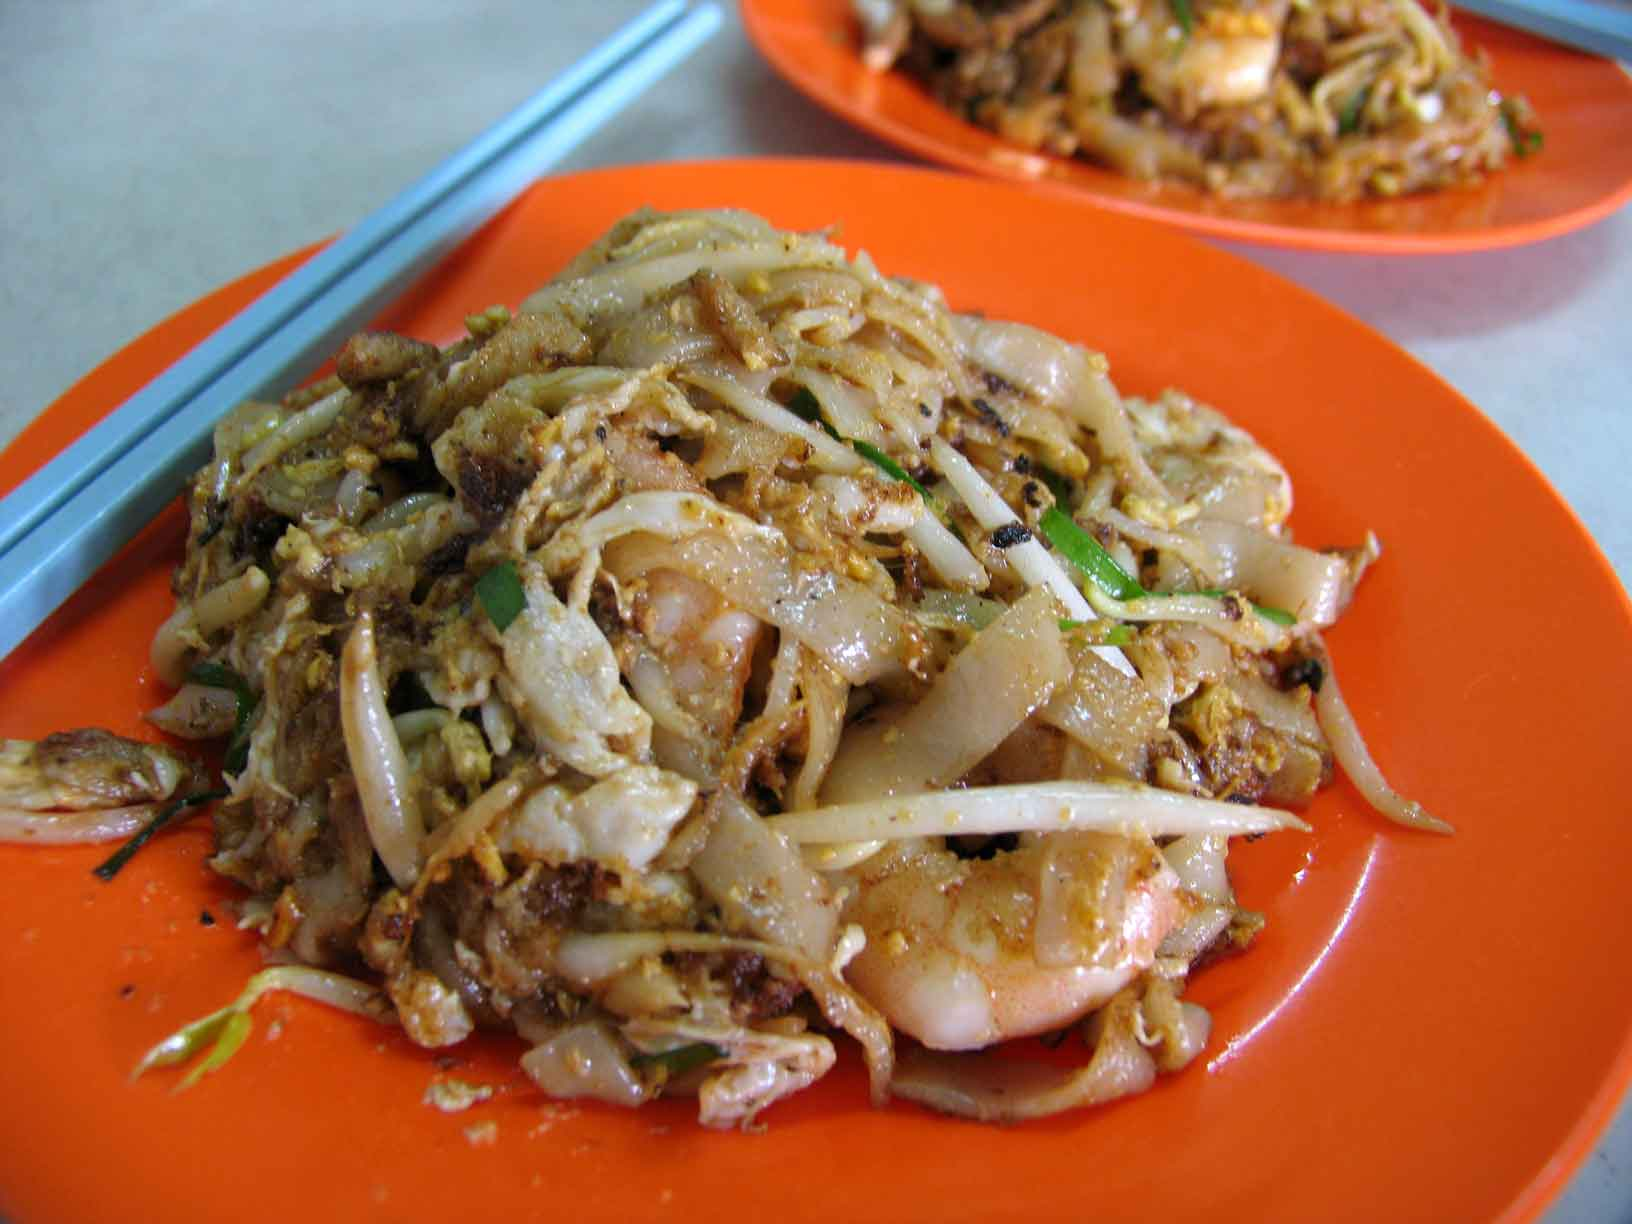 Pulau Tikus char koay teow